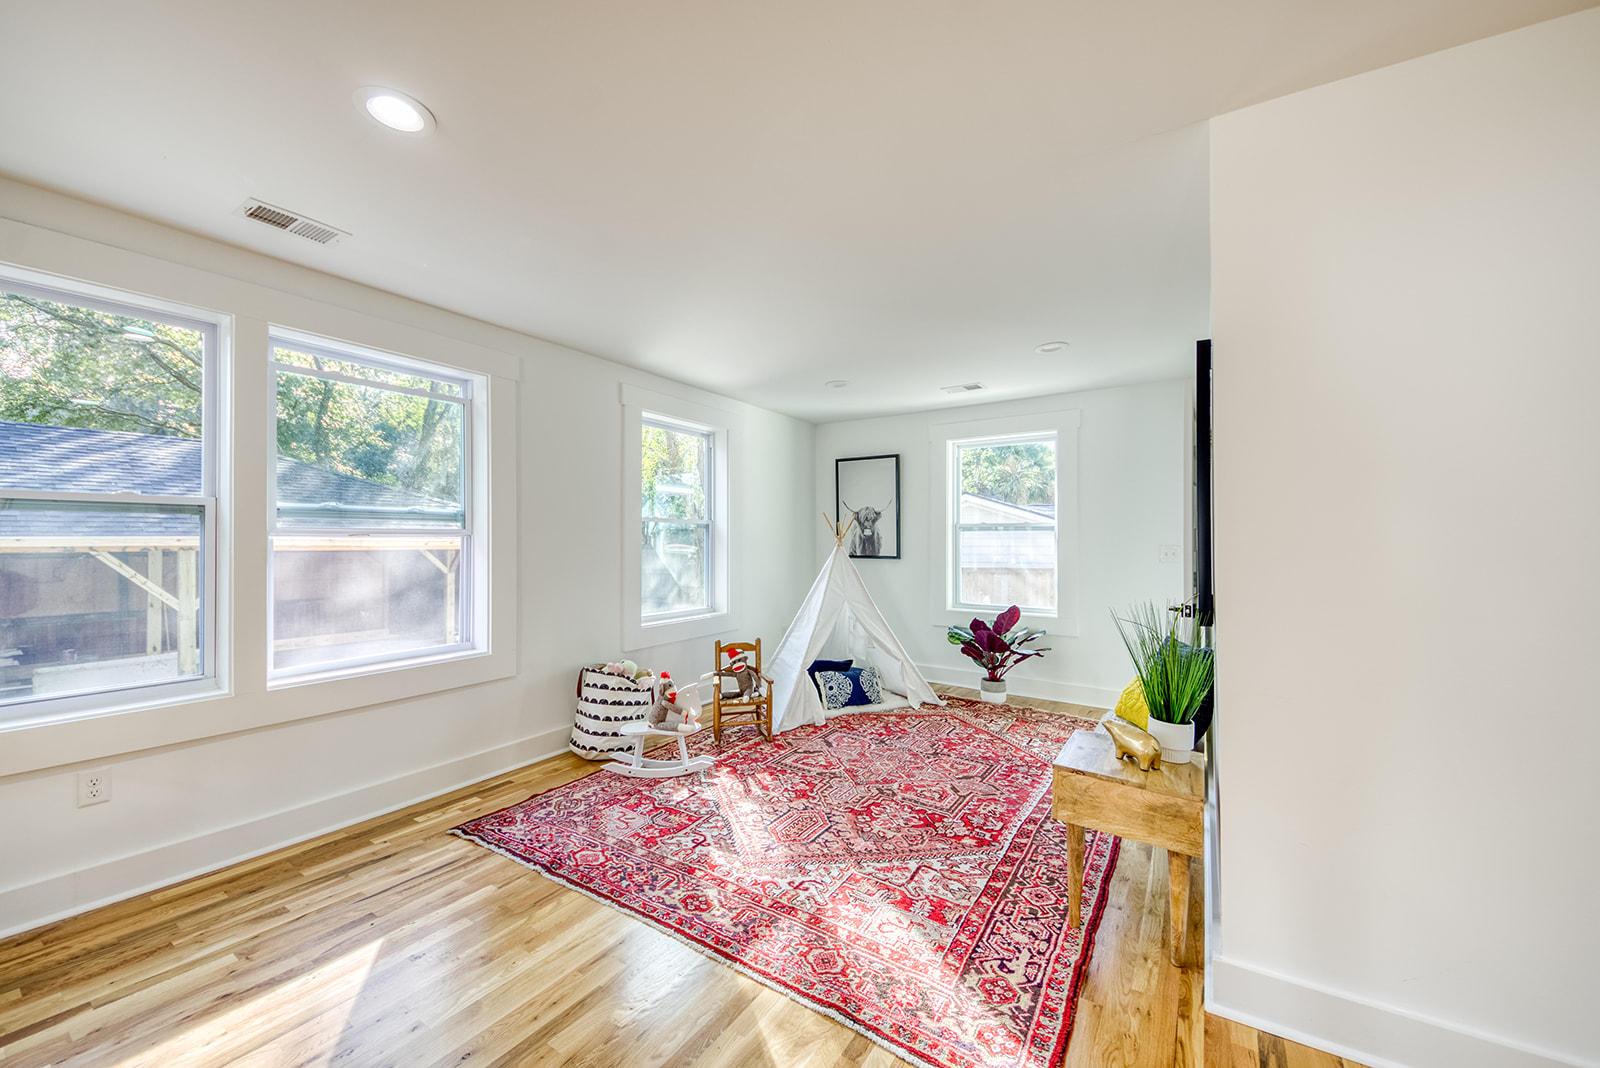 Bay View Acres Homes For Sale - 265 Coleman, Mount Pleasant, SC - 26